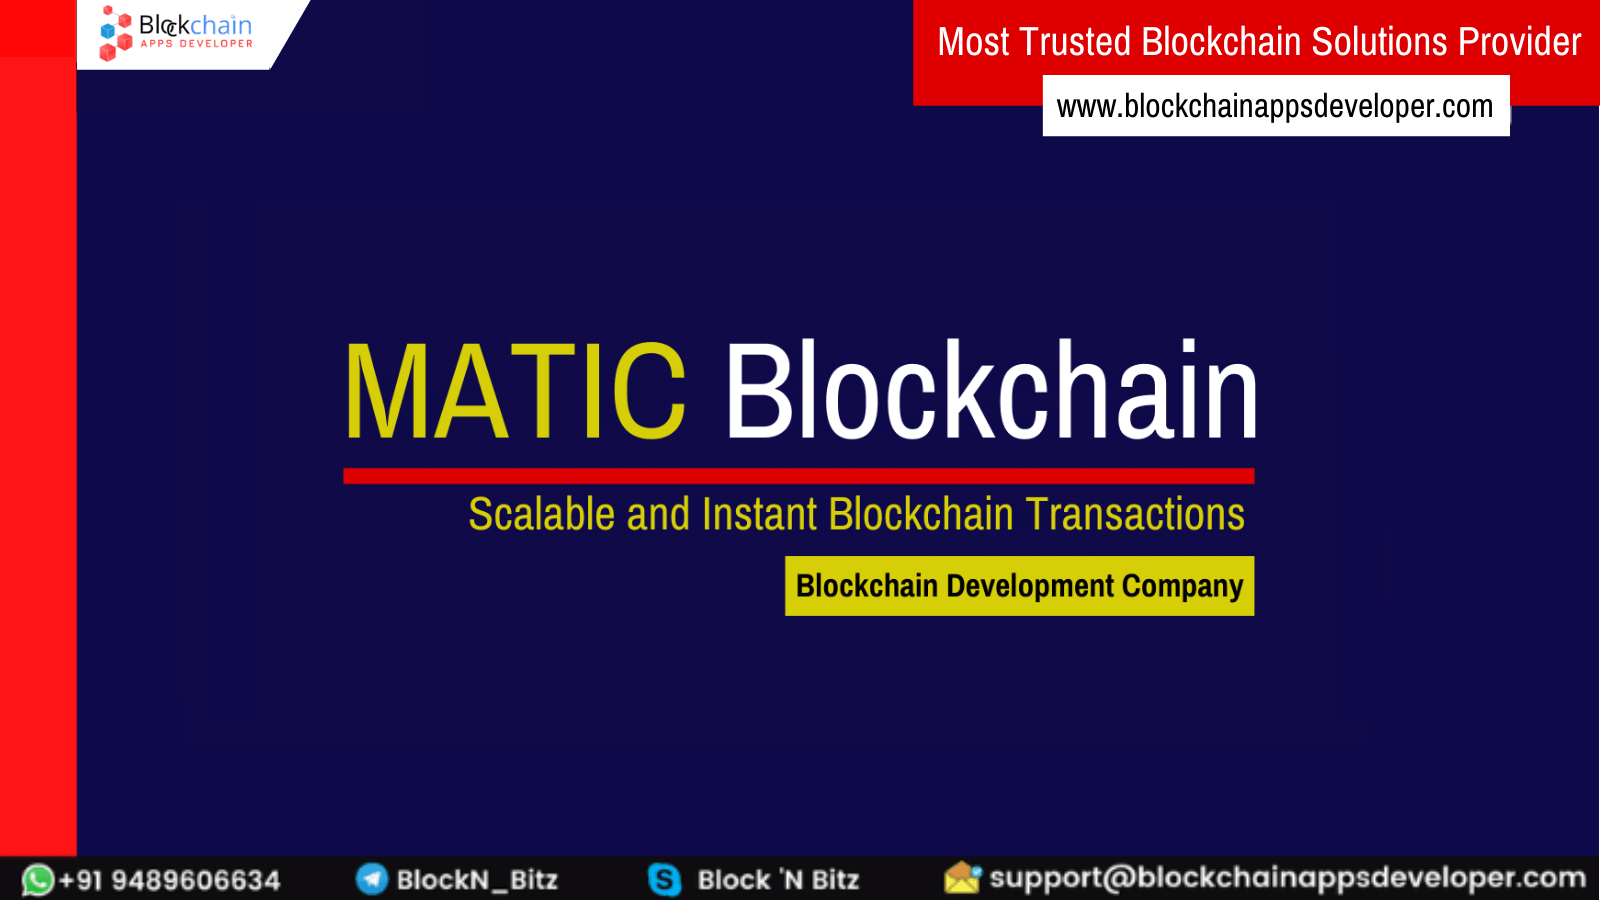 https://res.cloudinary.com/dt9okciwh/image/upload/v1606481617/blockchainappsdeveloper/matic-blockchain-development.png